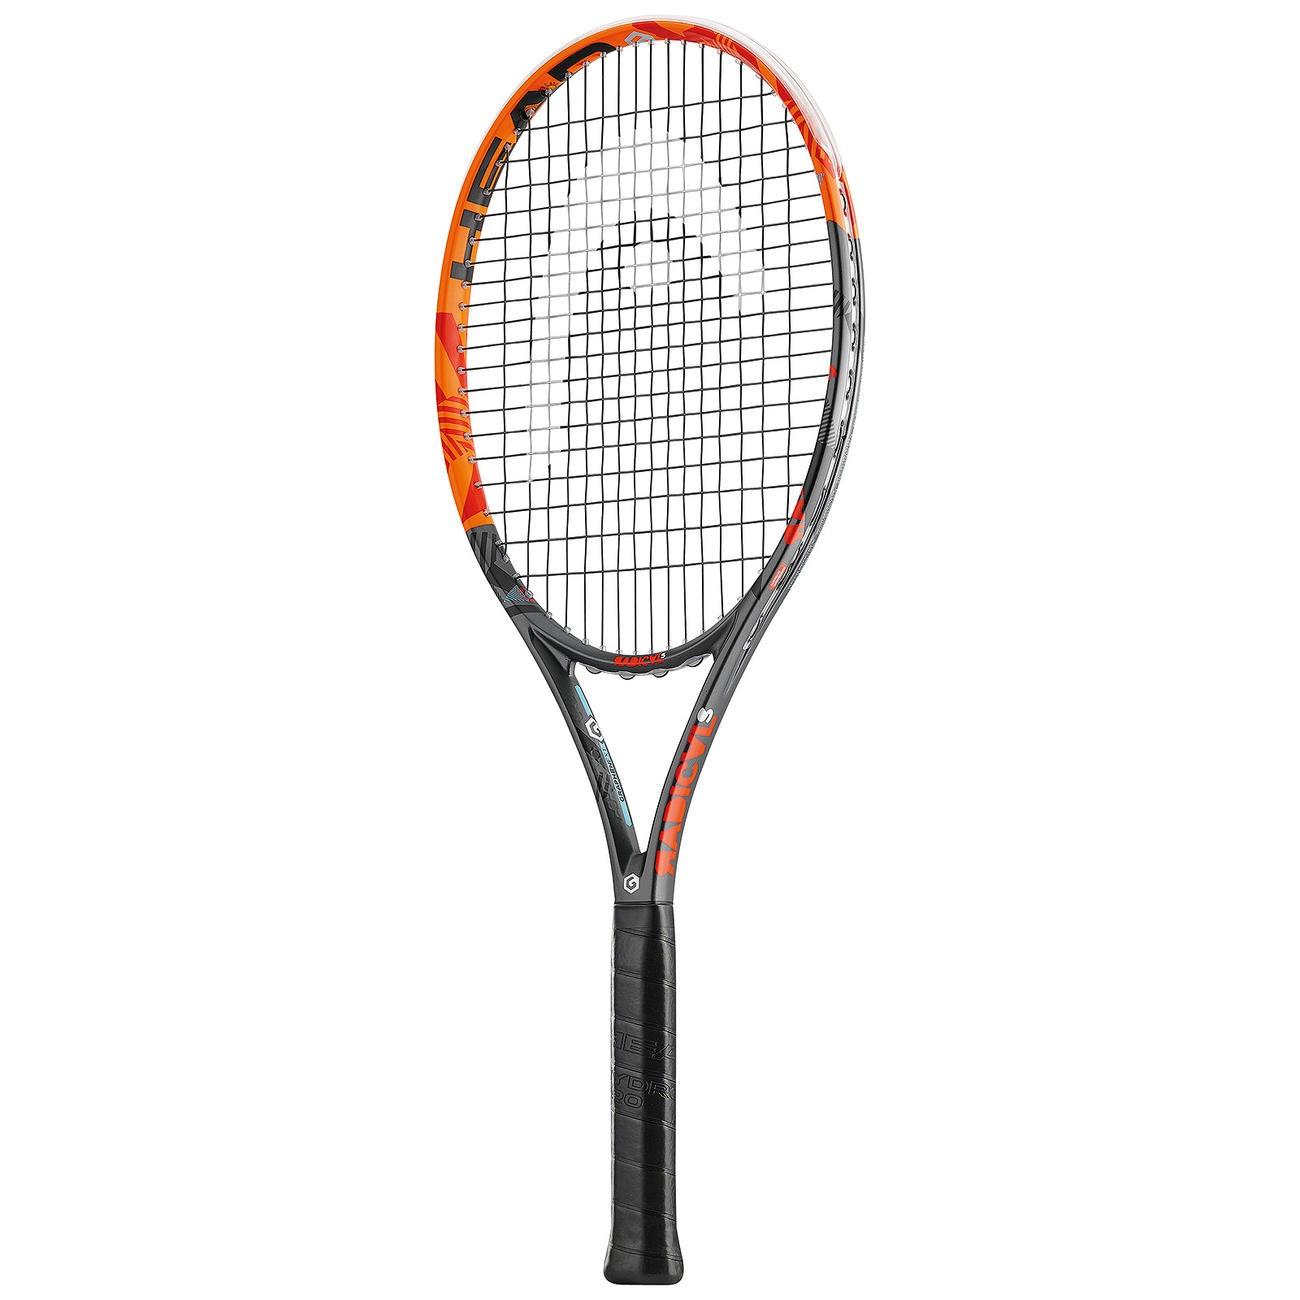 Rakieta tenisowa Head Graphene XT Radical S